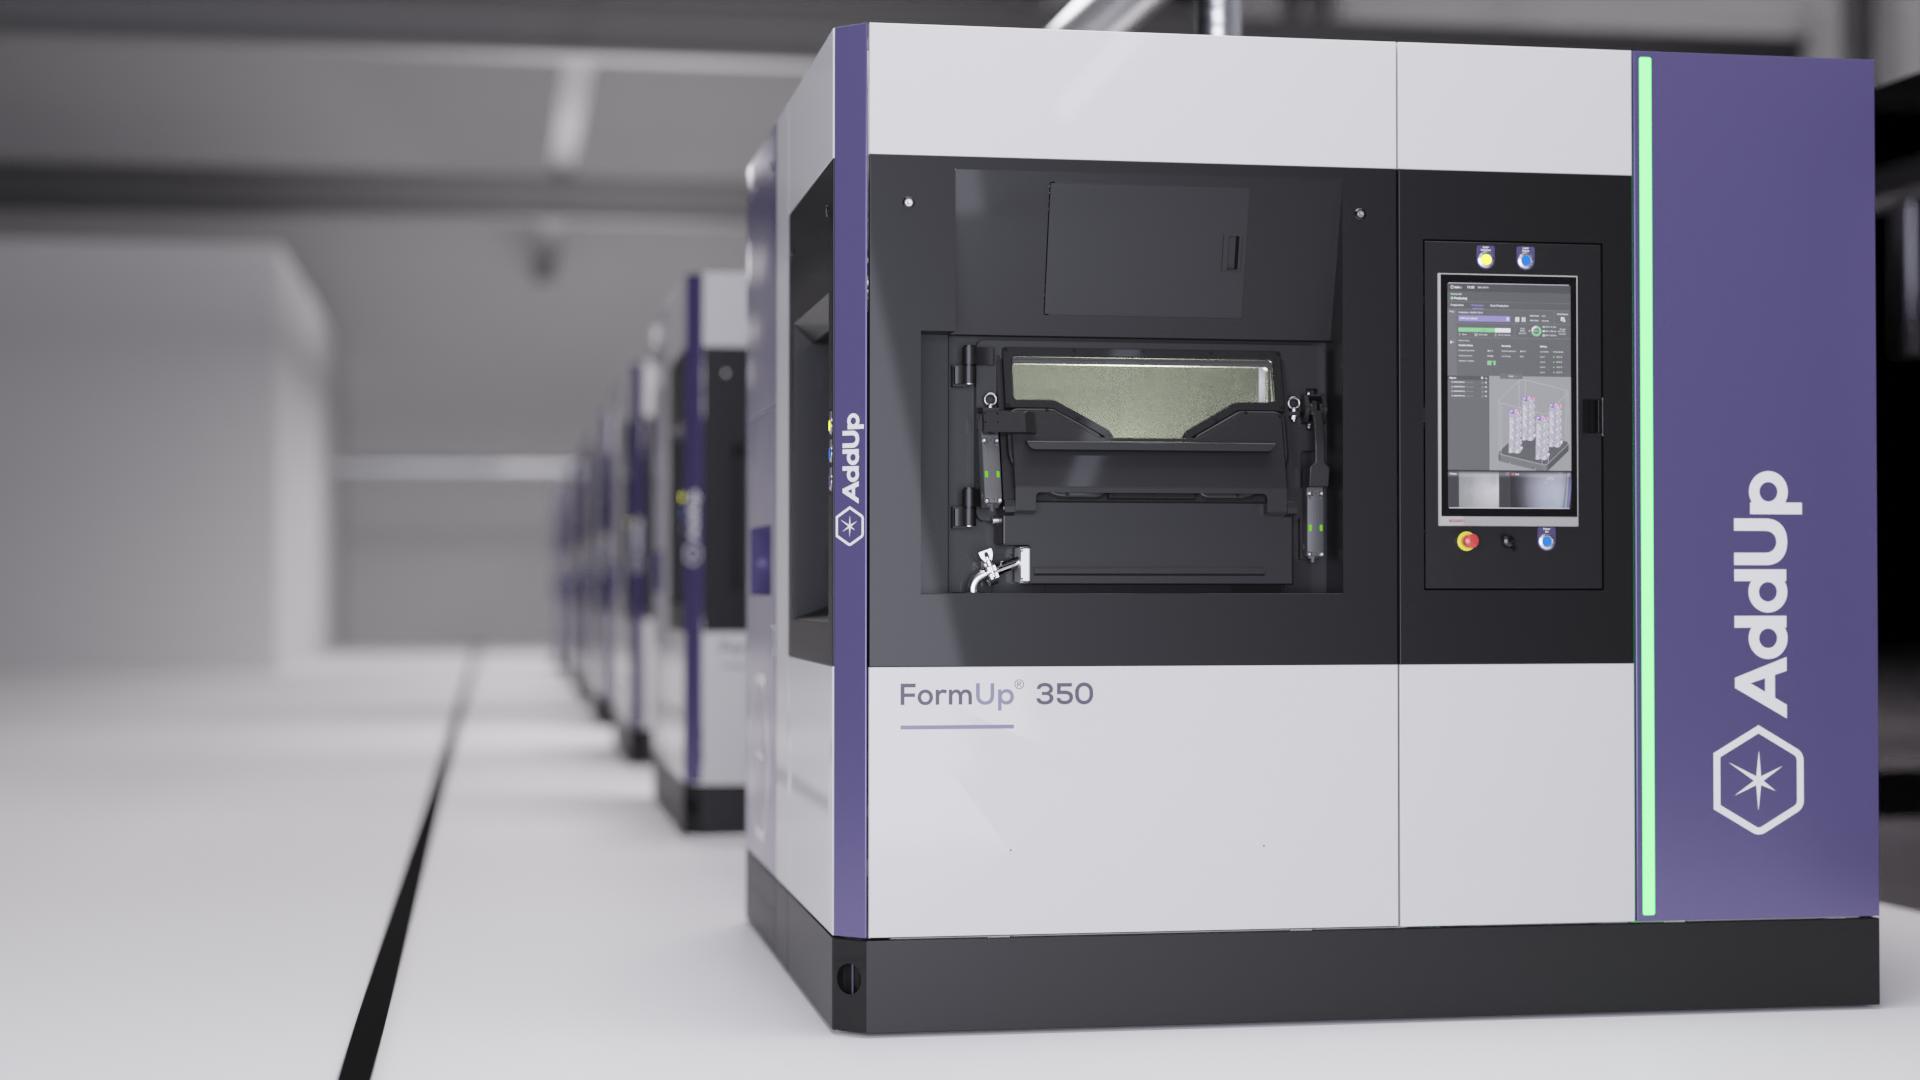 The FormUp 350 3D printer. Photo via AddUp.